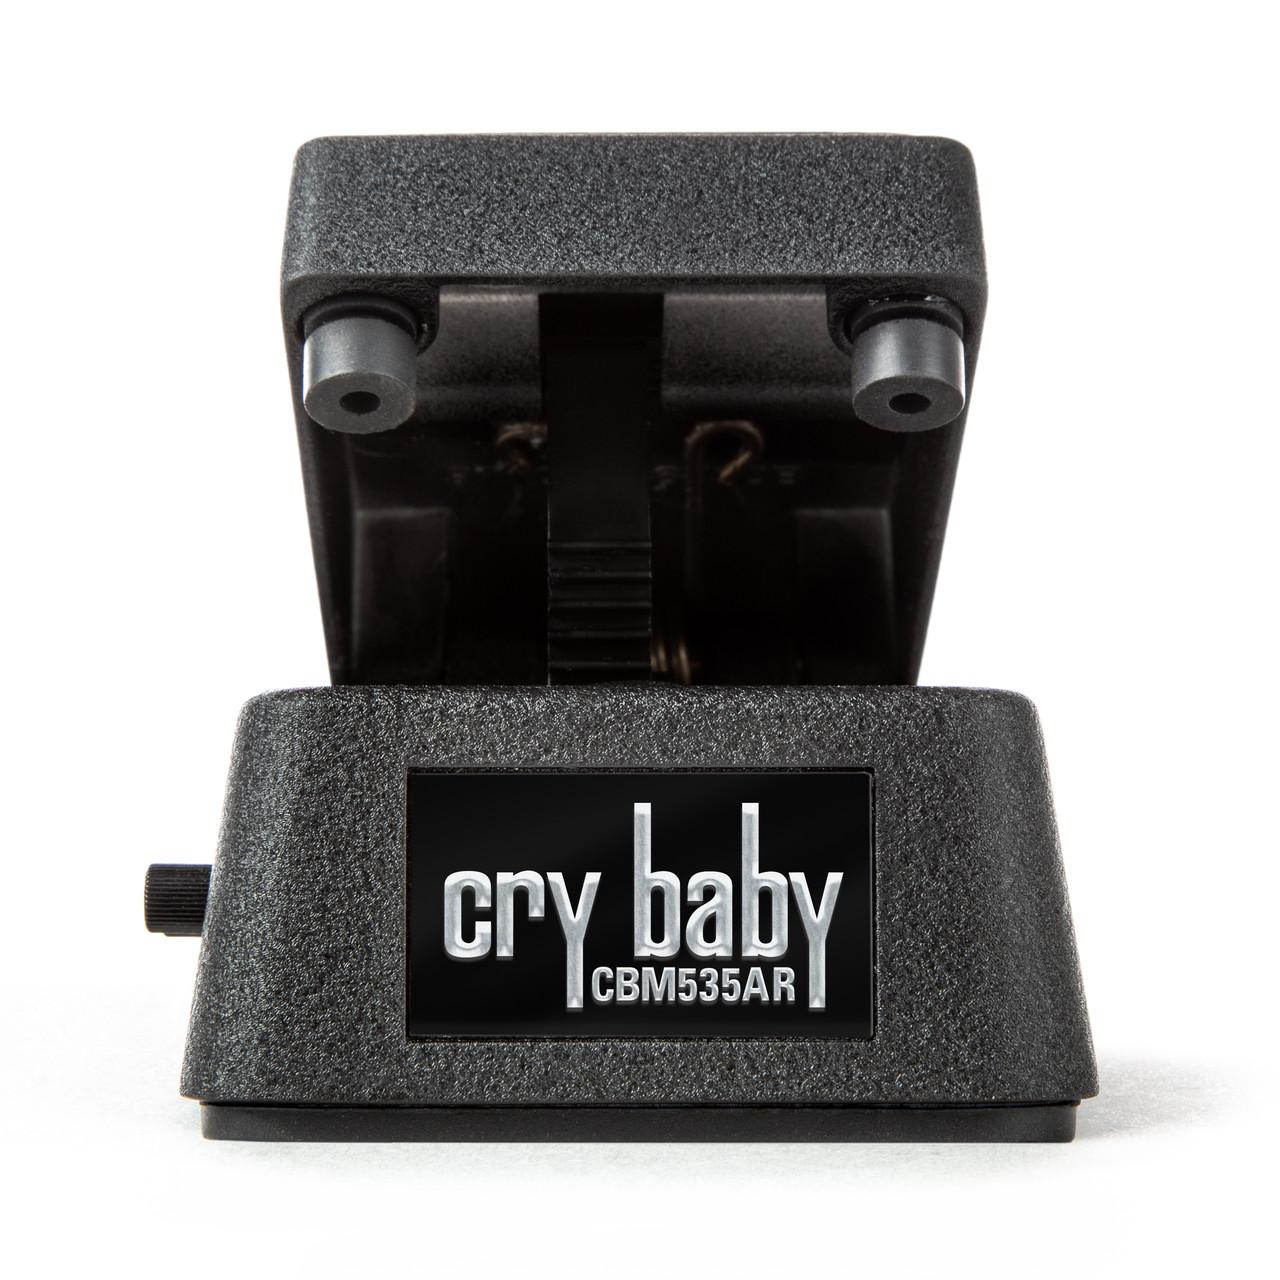 Dunlop CBM535AR CryBaby Q Mini Auto-Return Wah Pedal